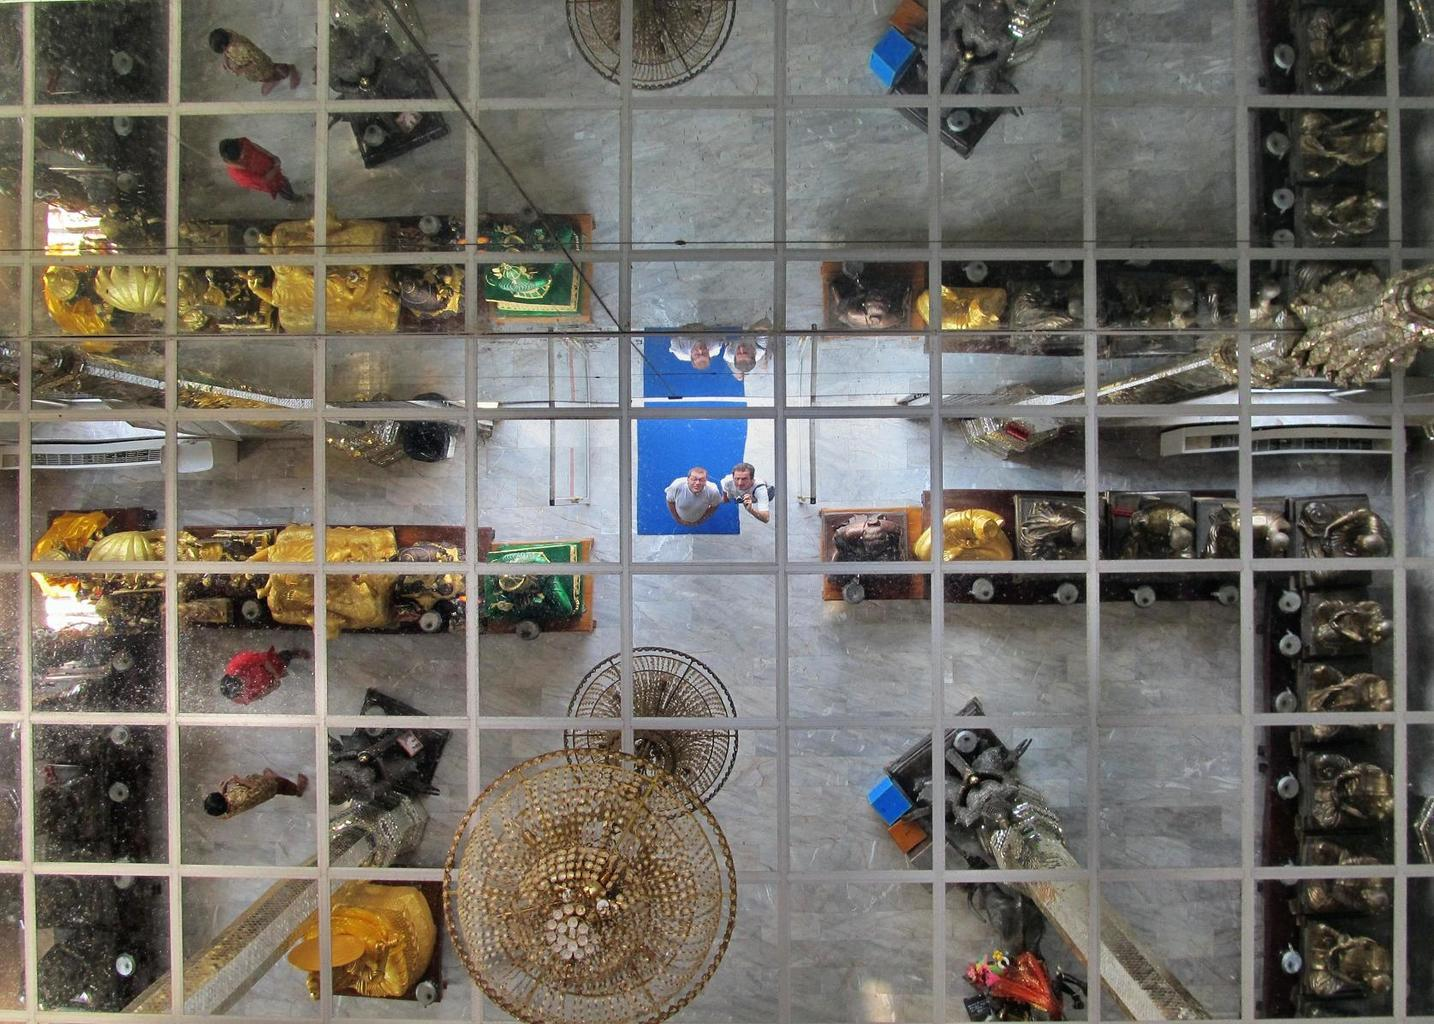 Zrcadlový strop ve Vihanu - Wat Muang - Thajsko